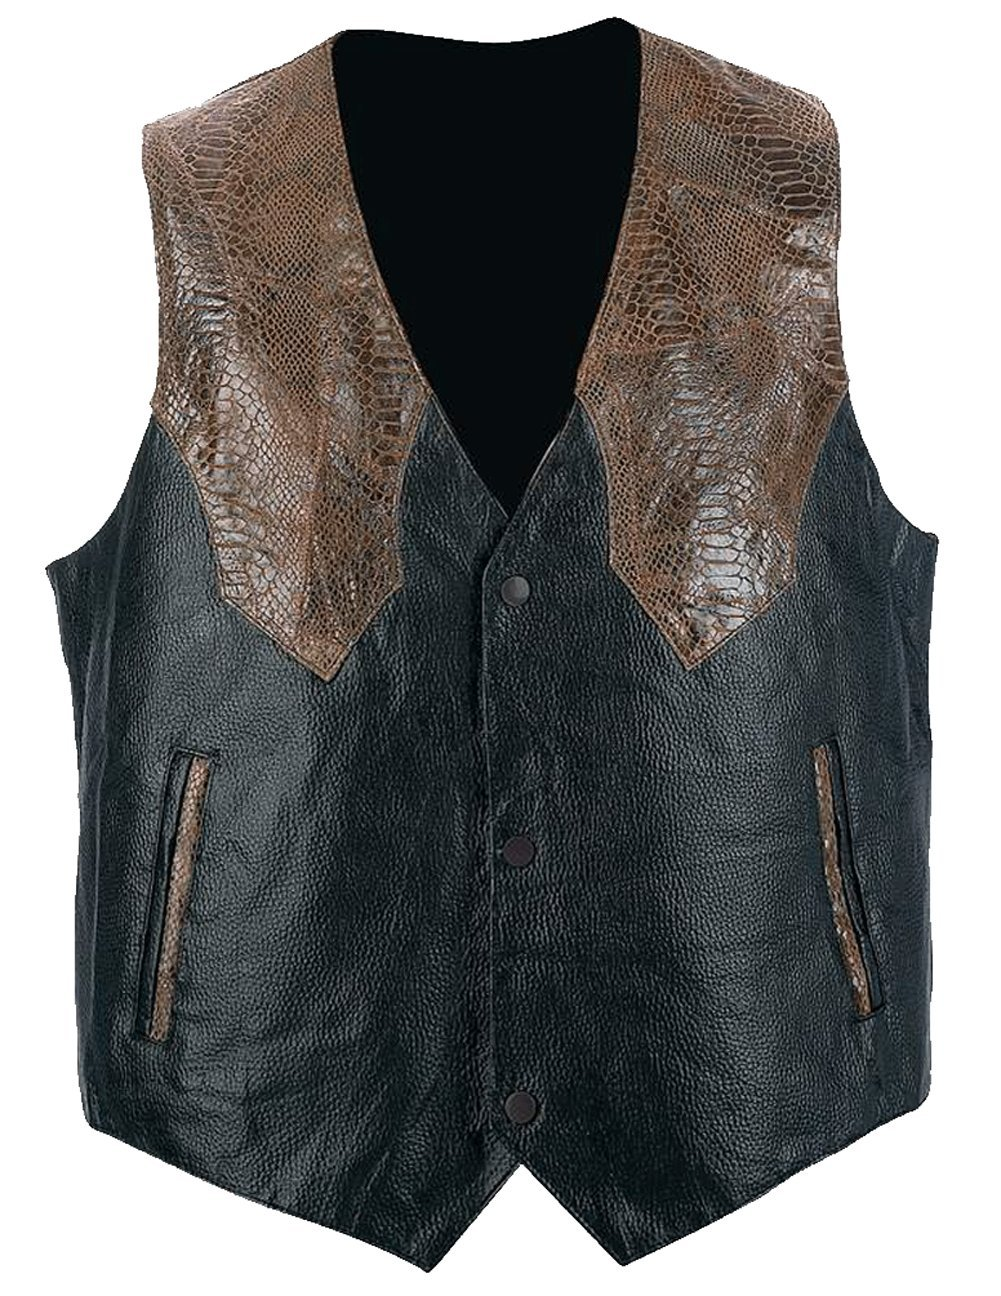 Giovanni Navarre™ Hand-Sewn Pebble Grain Genuine Leather Western-Style Vest,XL